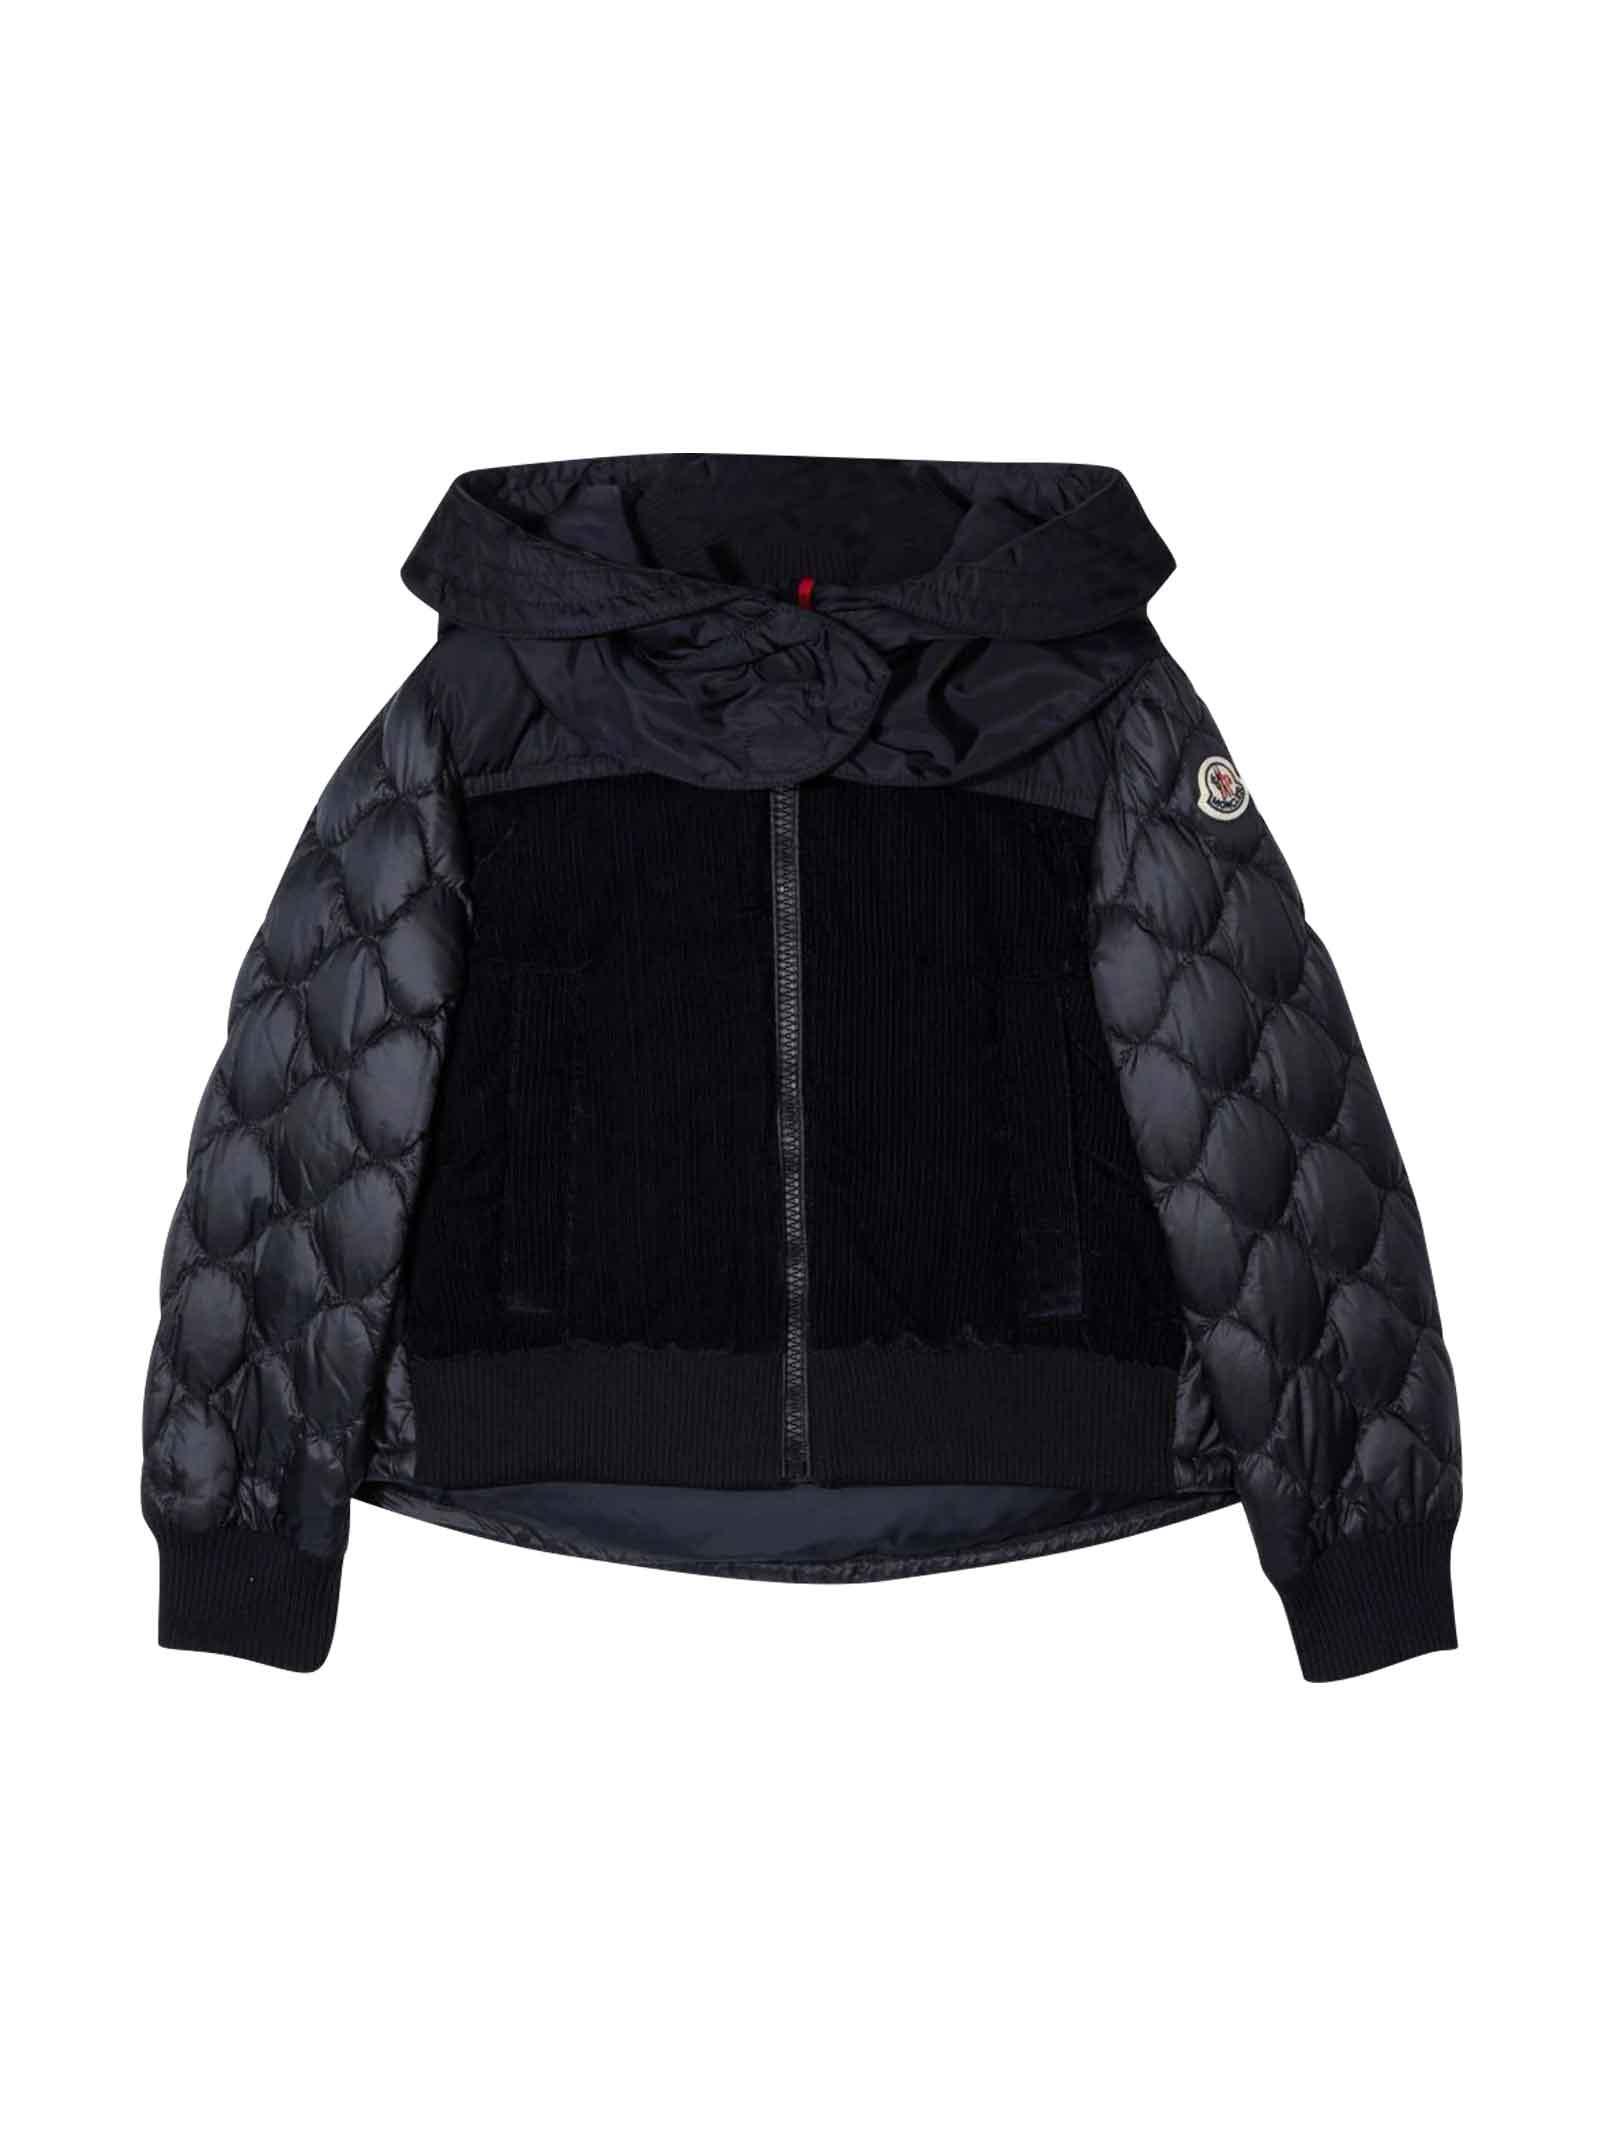 Moncler Black Down Jacket